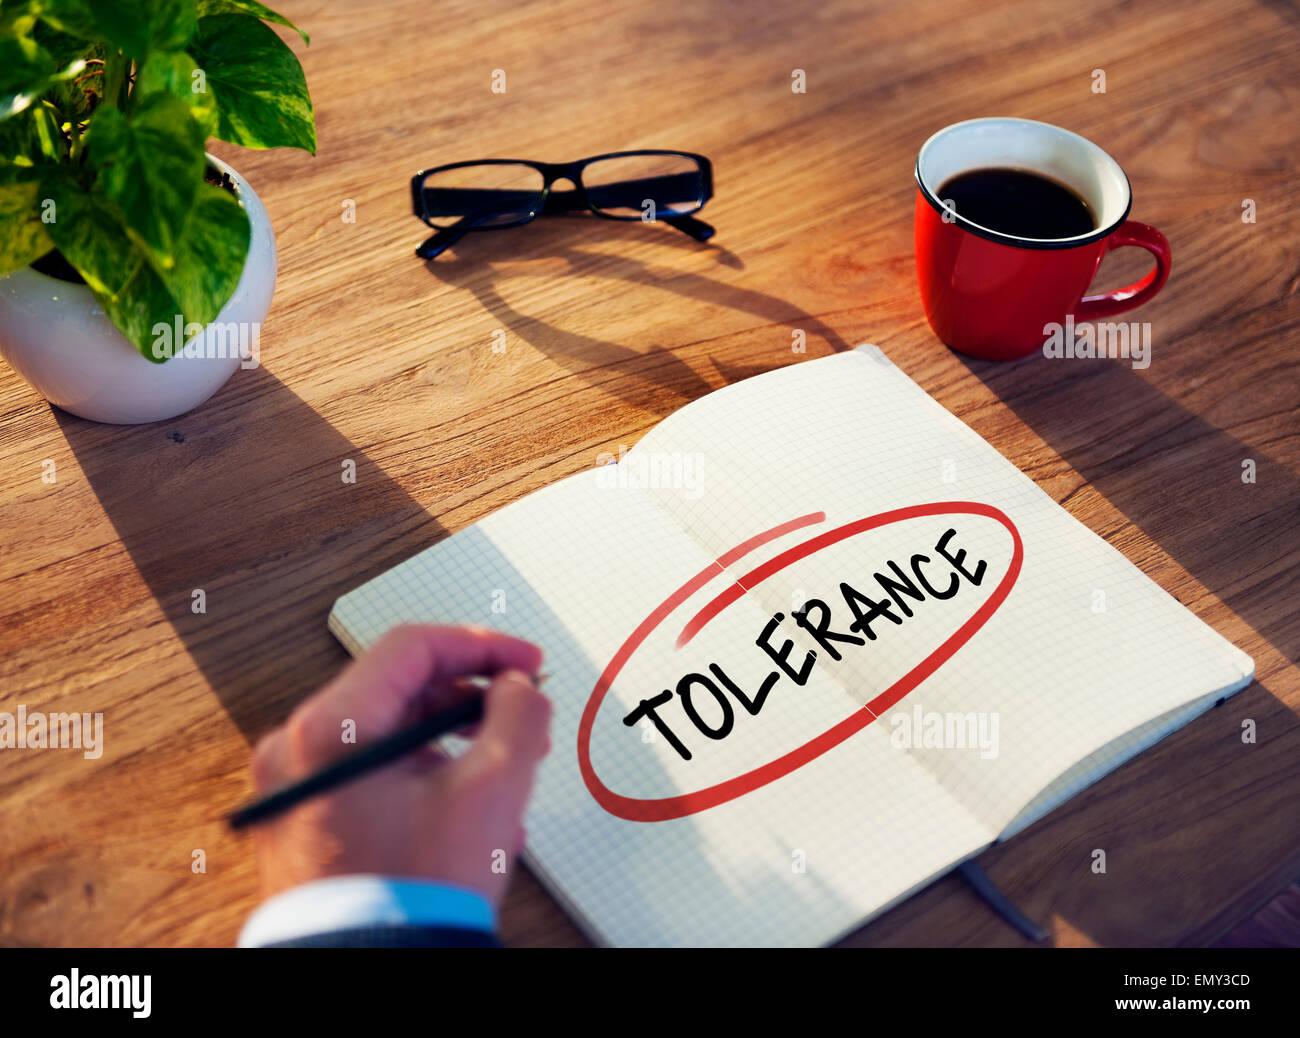 Businessman Writing the Word 'Tolerance' - Stock Image